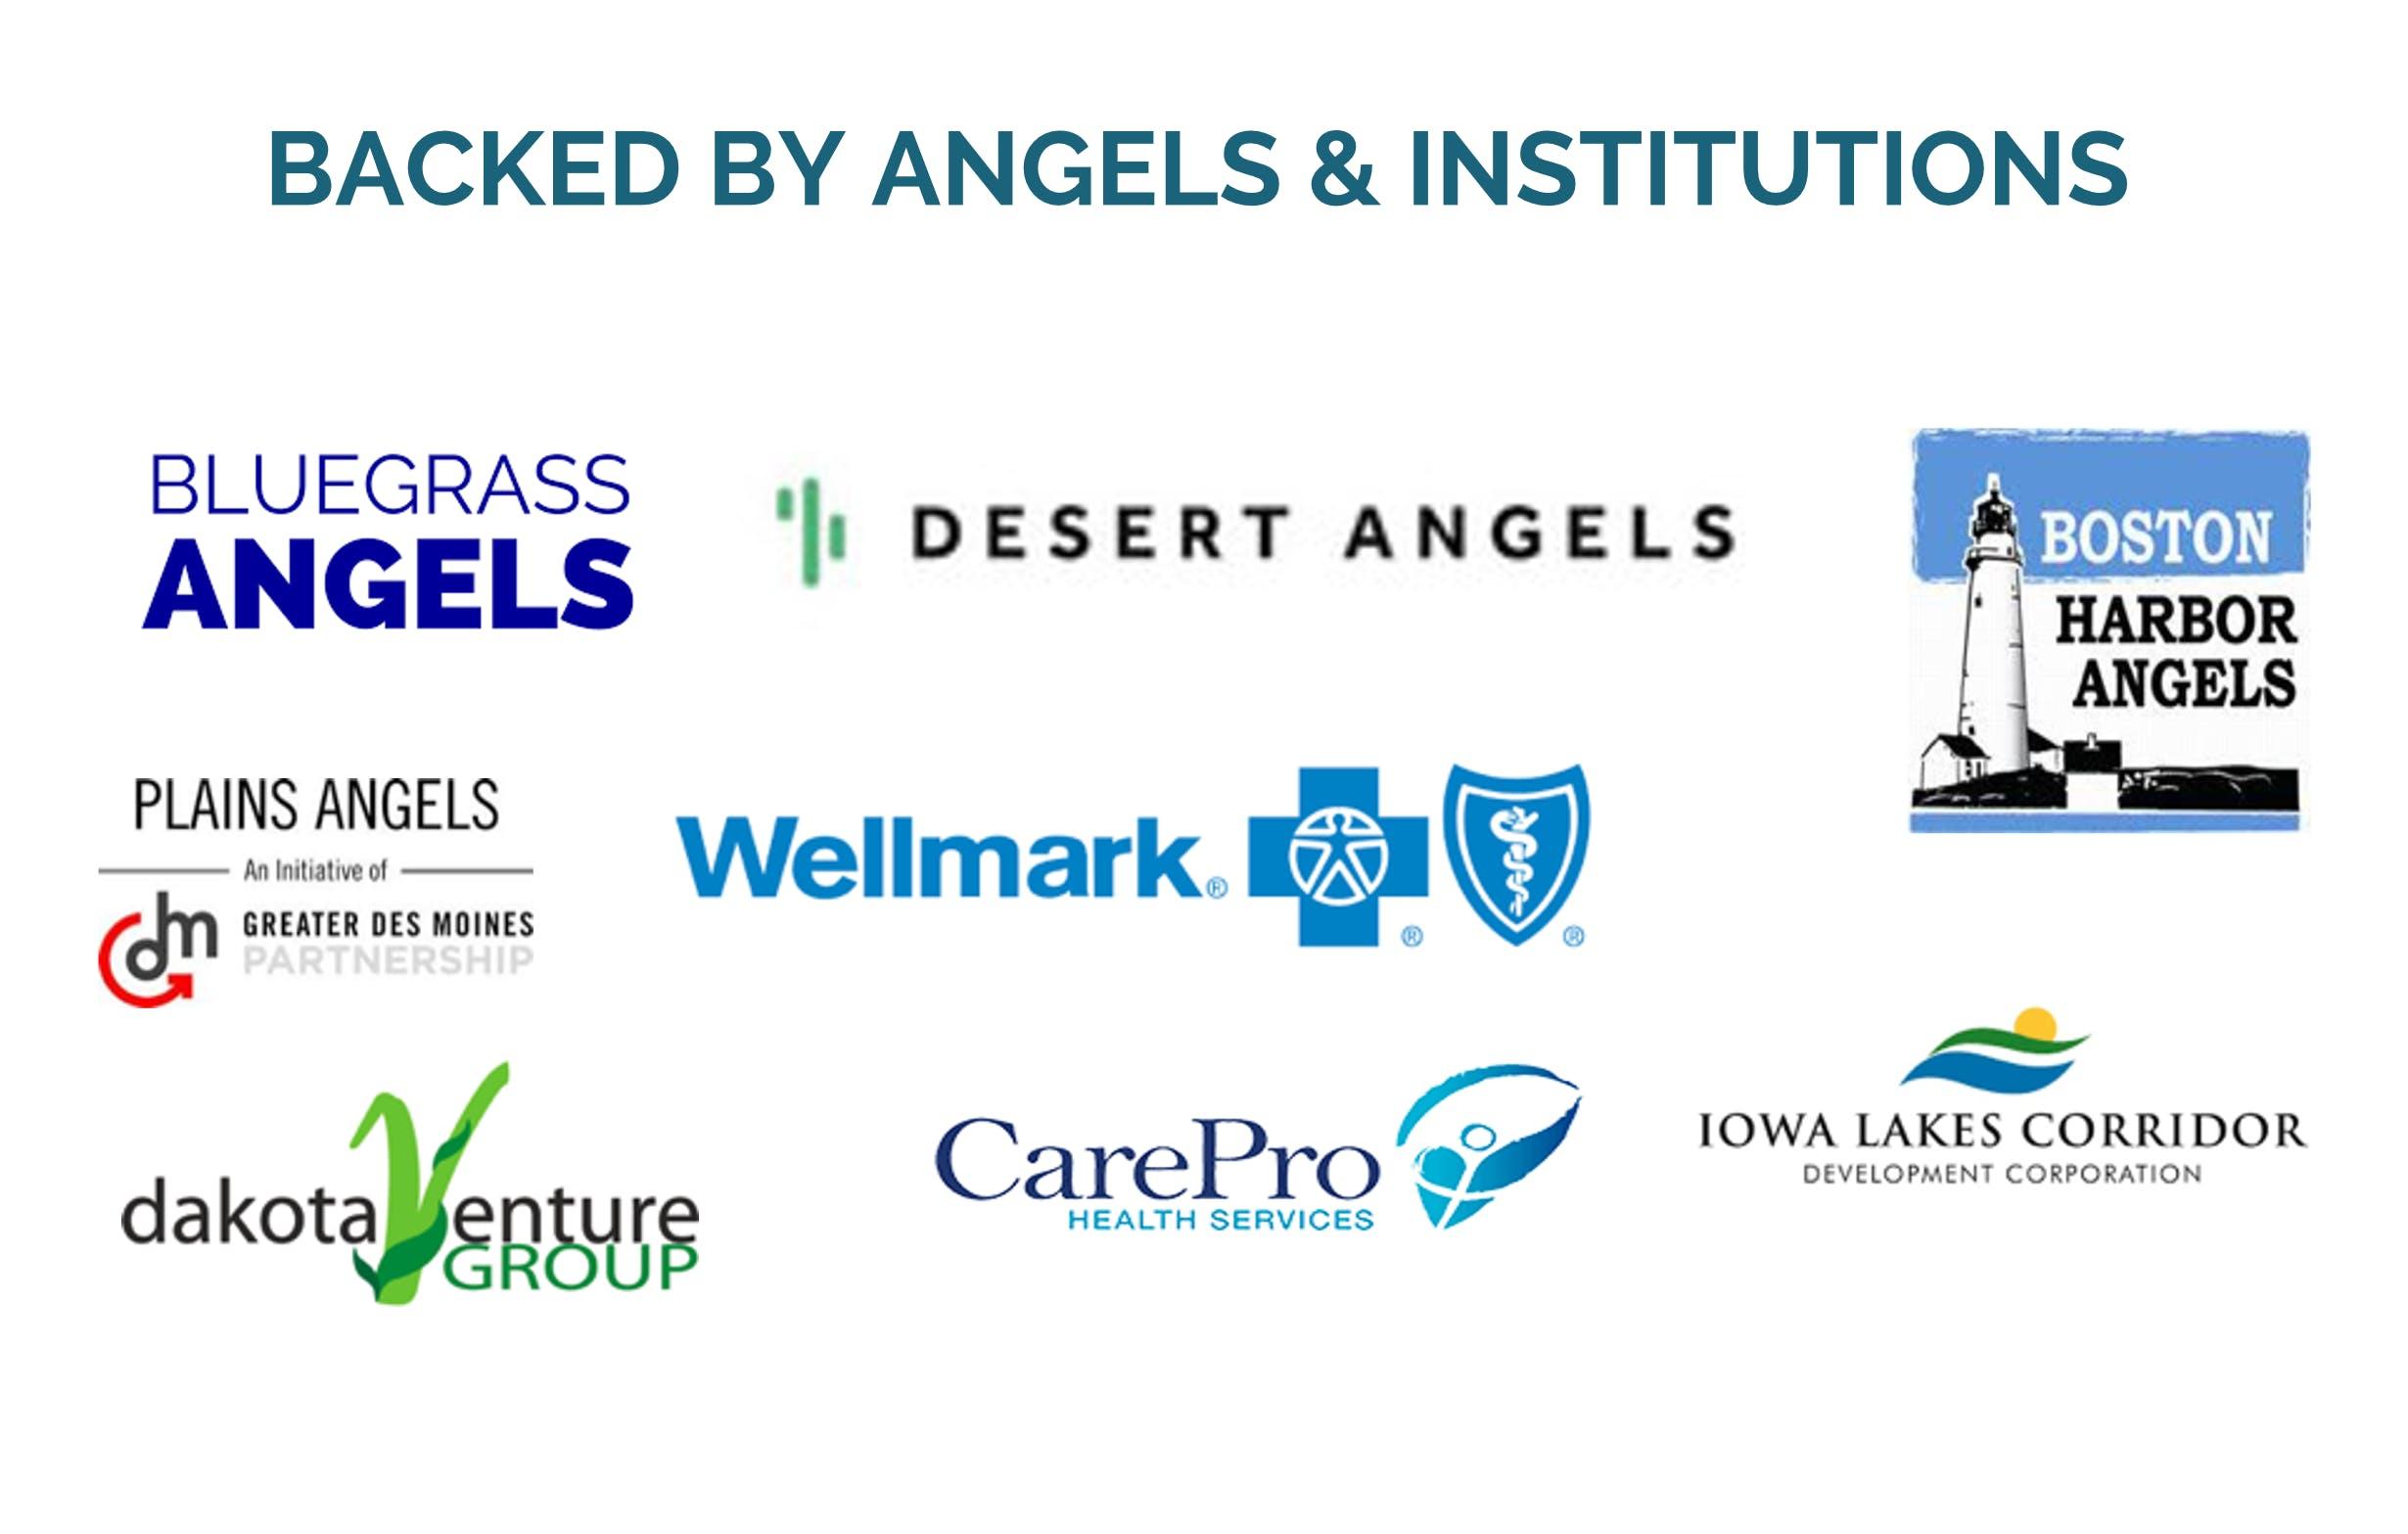 Bluegrass Angels Desert Angels Plains Angels Wellmark Boston harbor Angels Iowa Lakes Corridor CarePro Health Dakota Venture Group